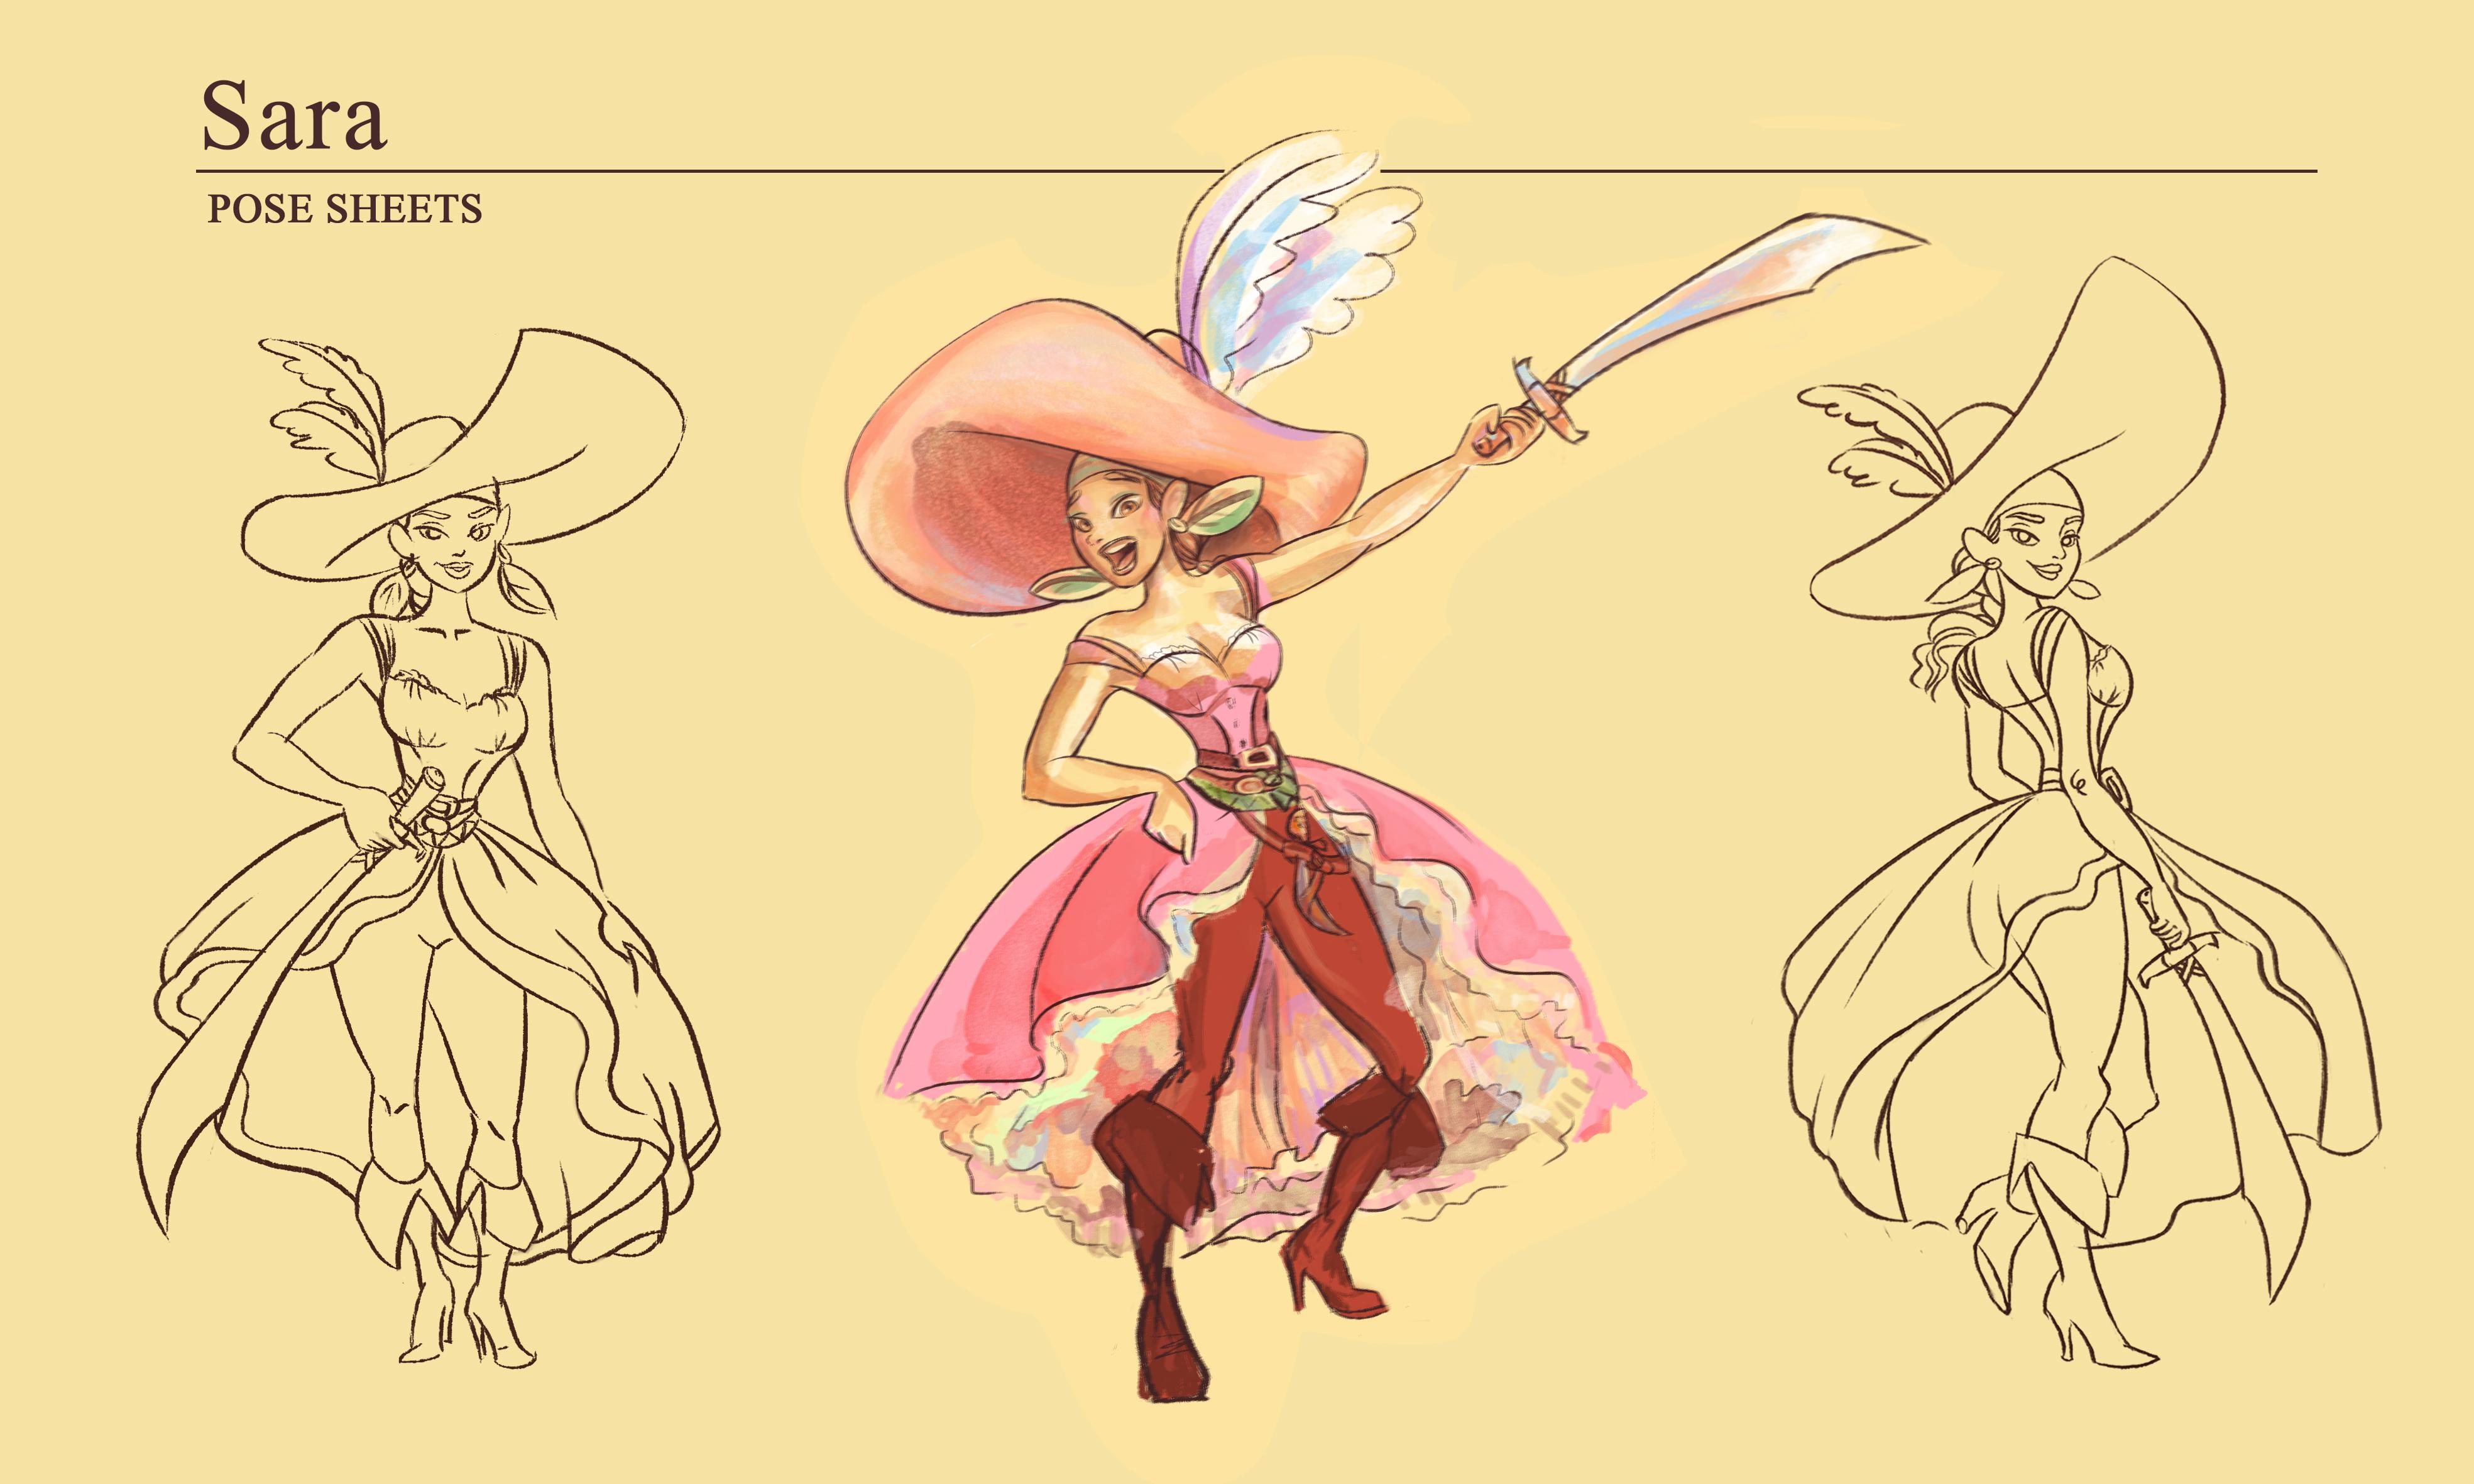 Sara - A pirata